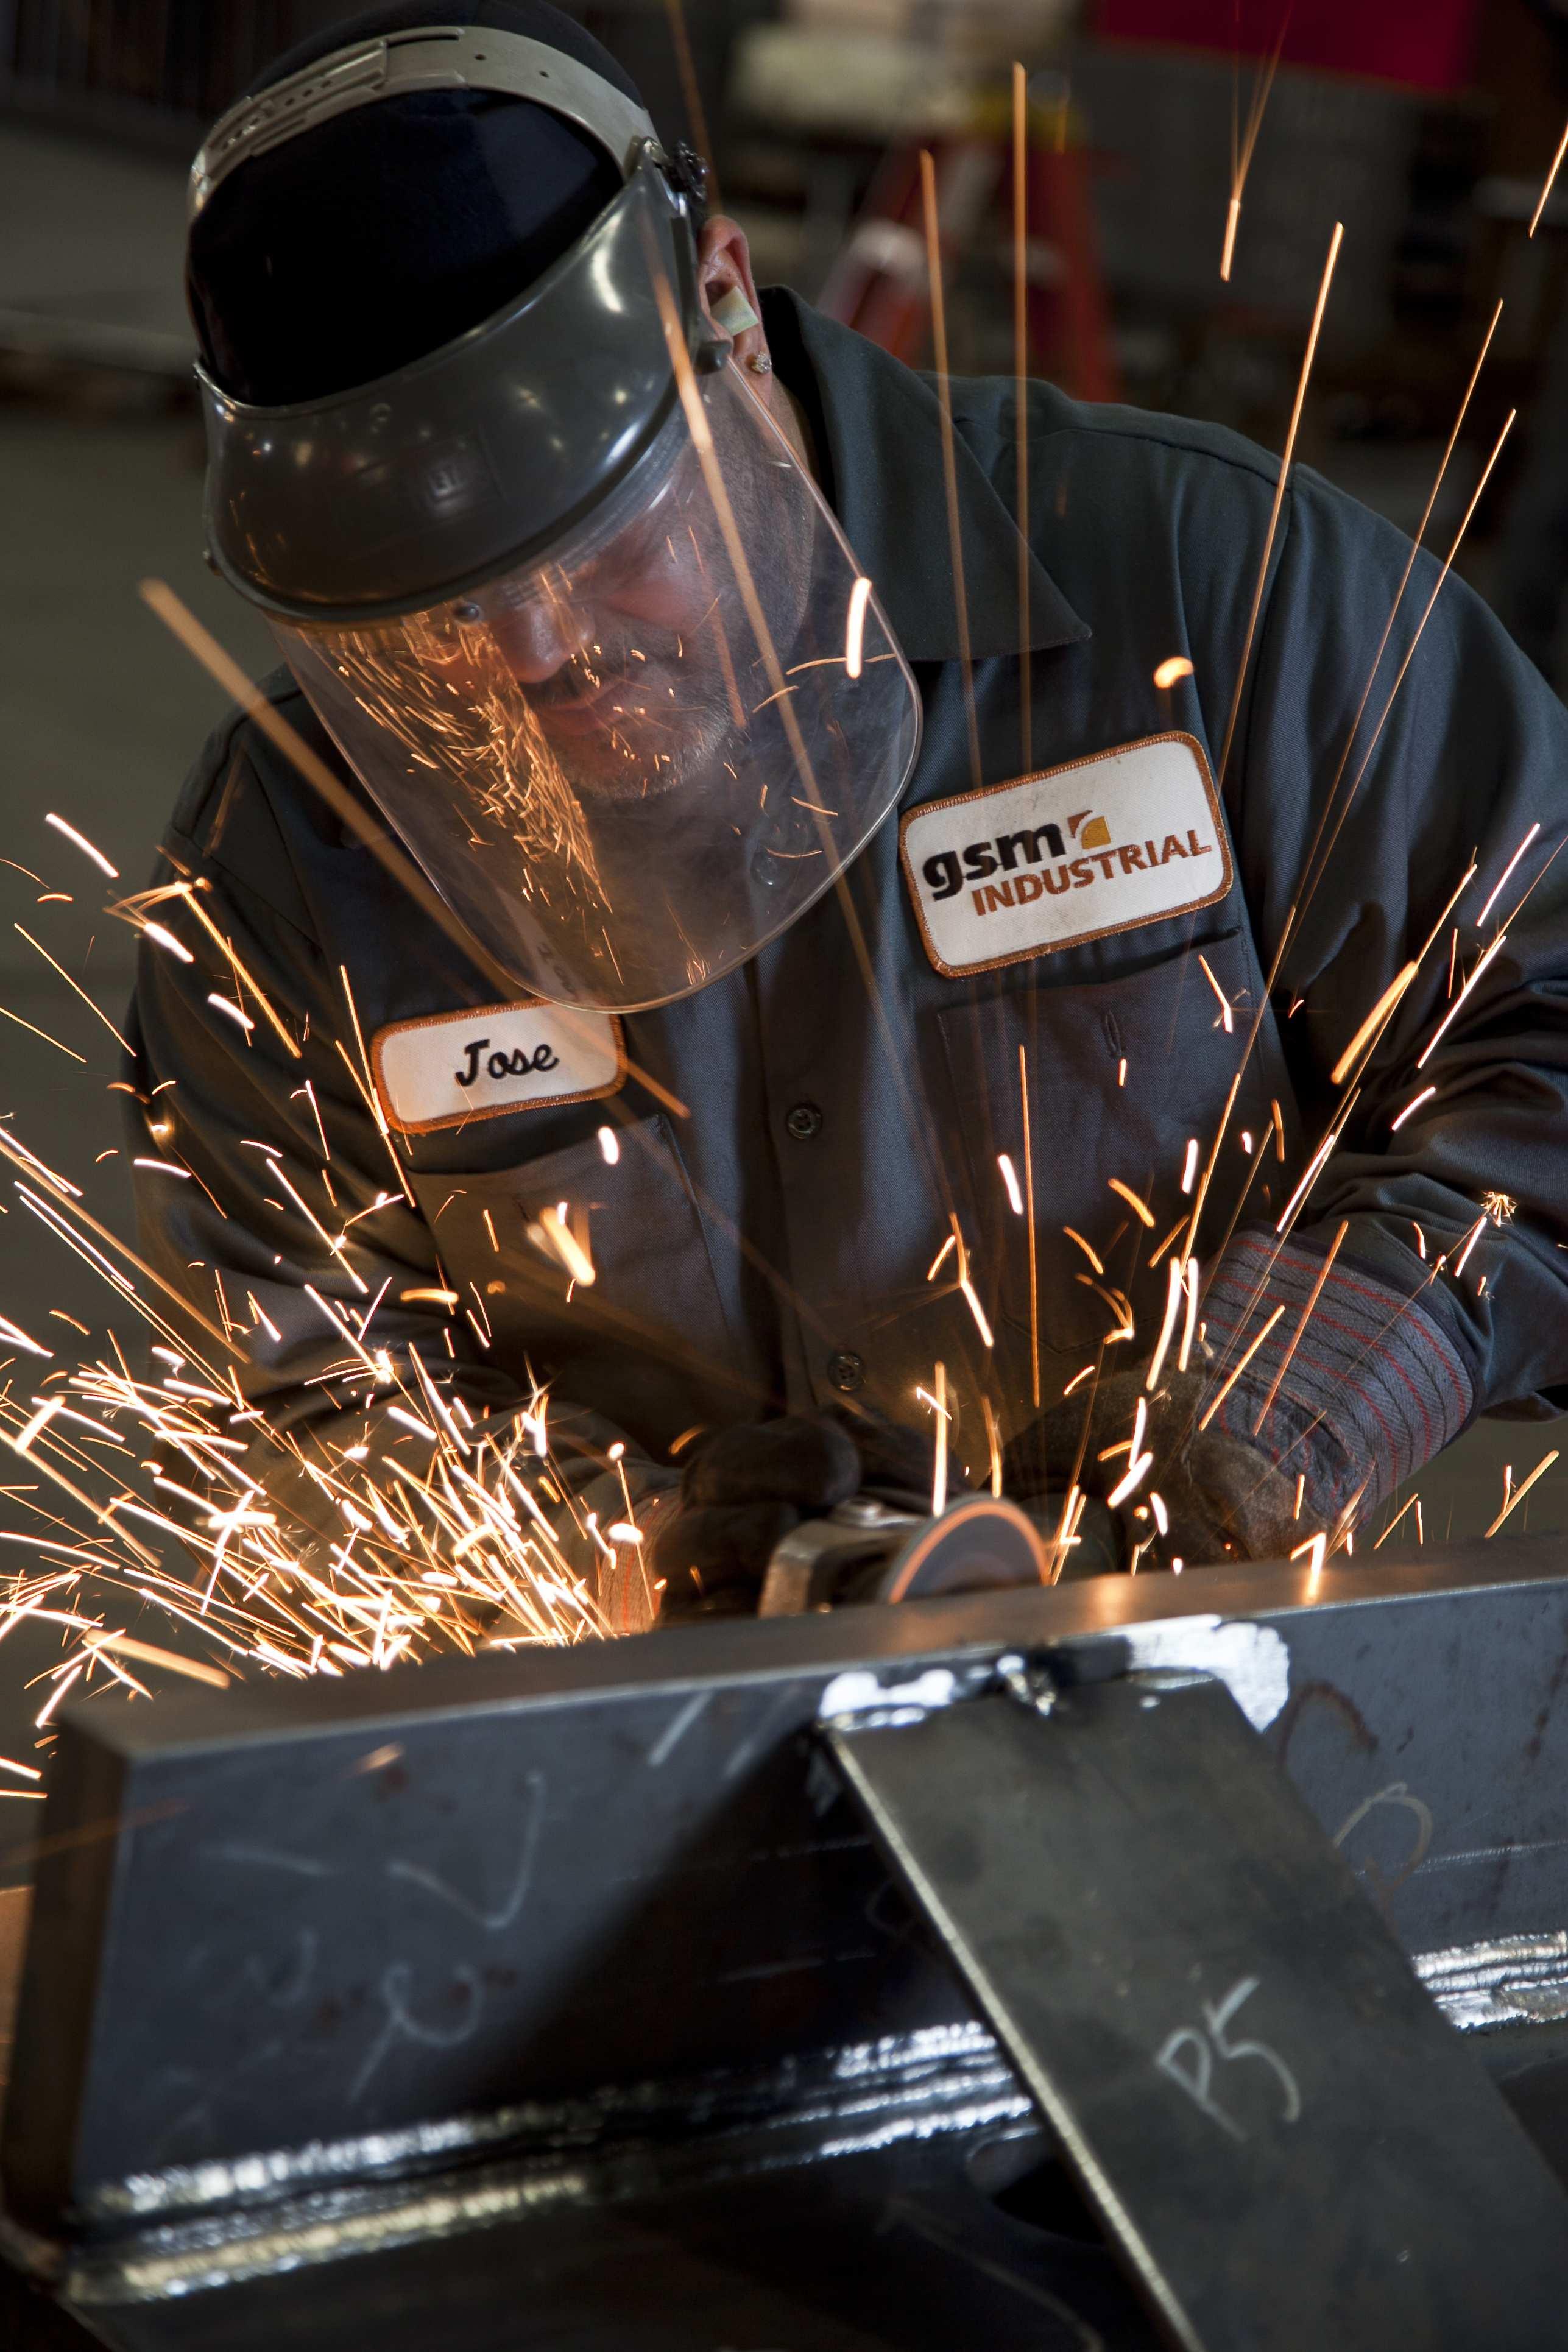 GSM Industrial Welding Services